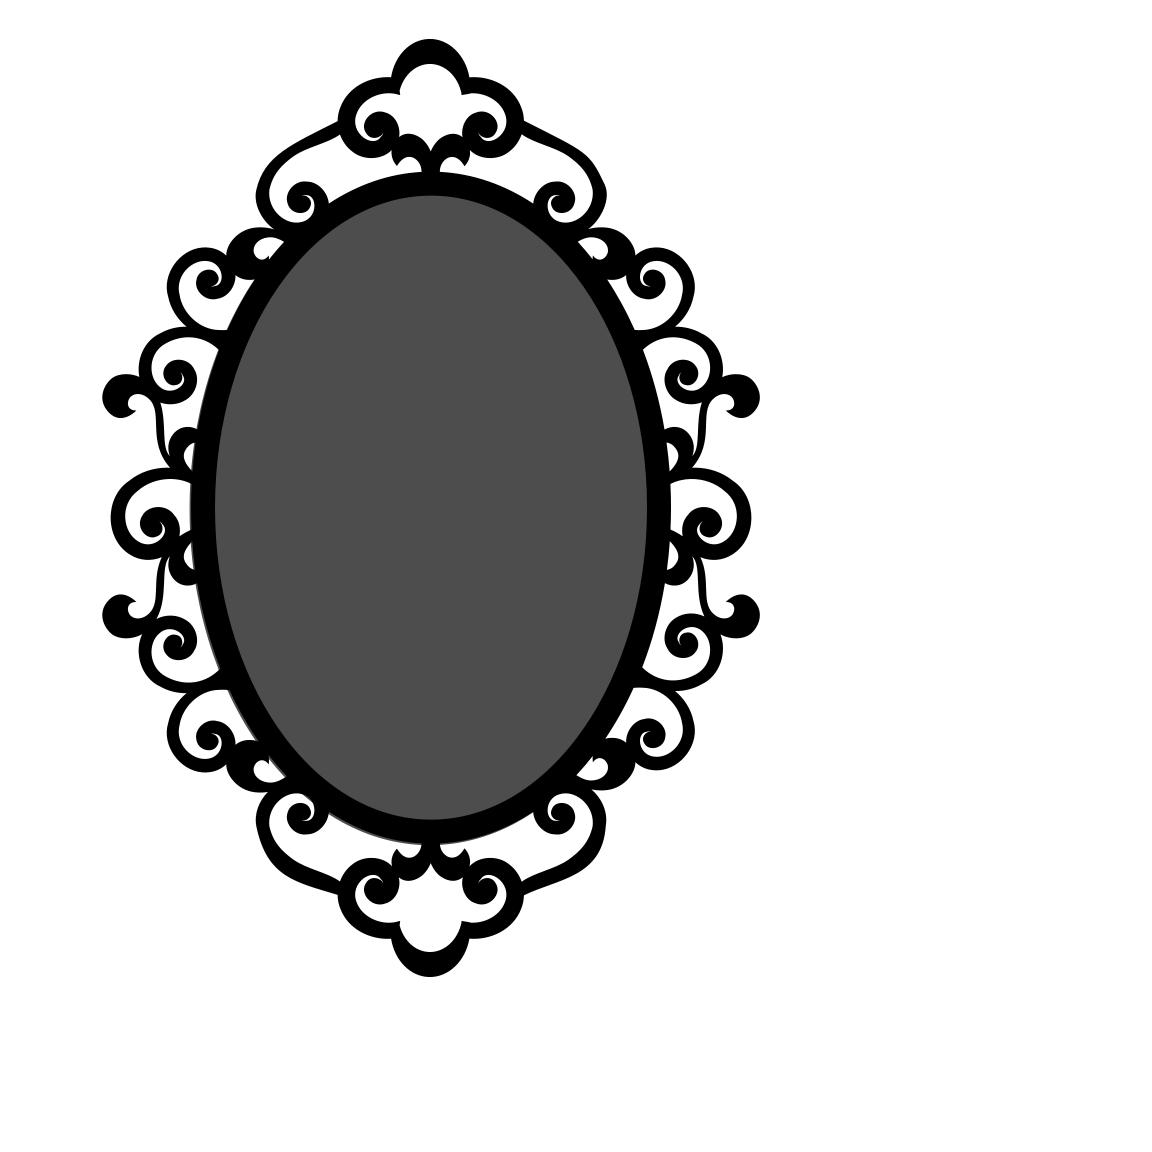 http://www.4shared.com/file/bgupZJE0/JennMcQ-swirly_oval_frame.html